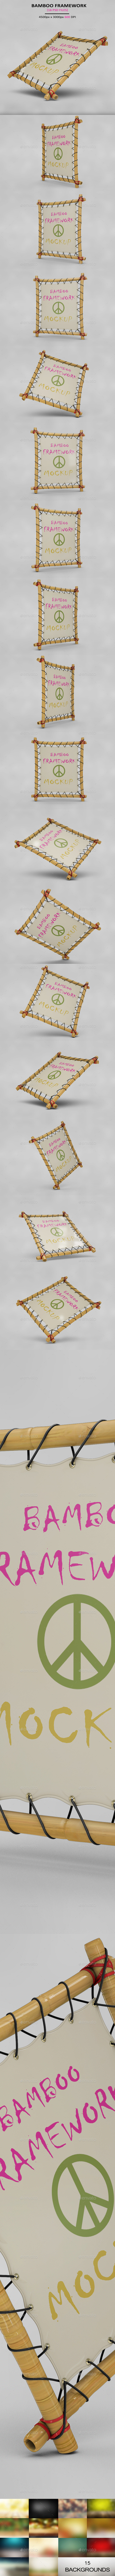 Bamboo Frame MockUp - Product Mock-Ups Graphics